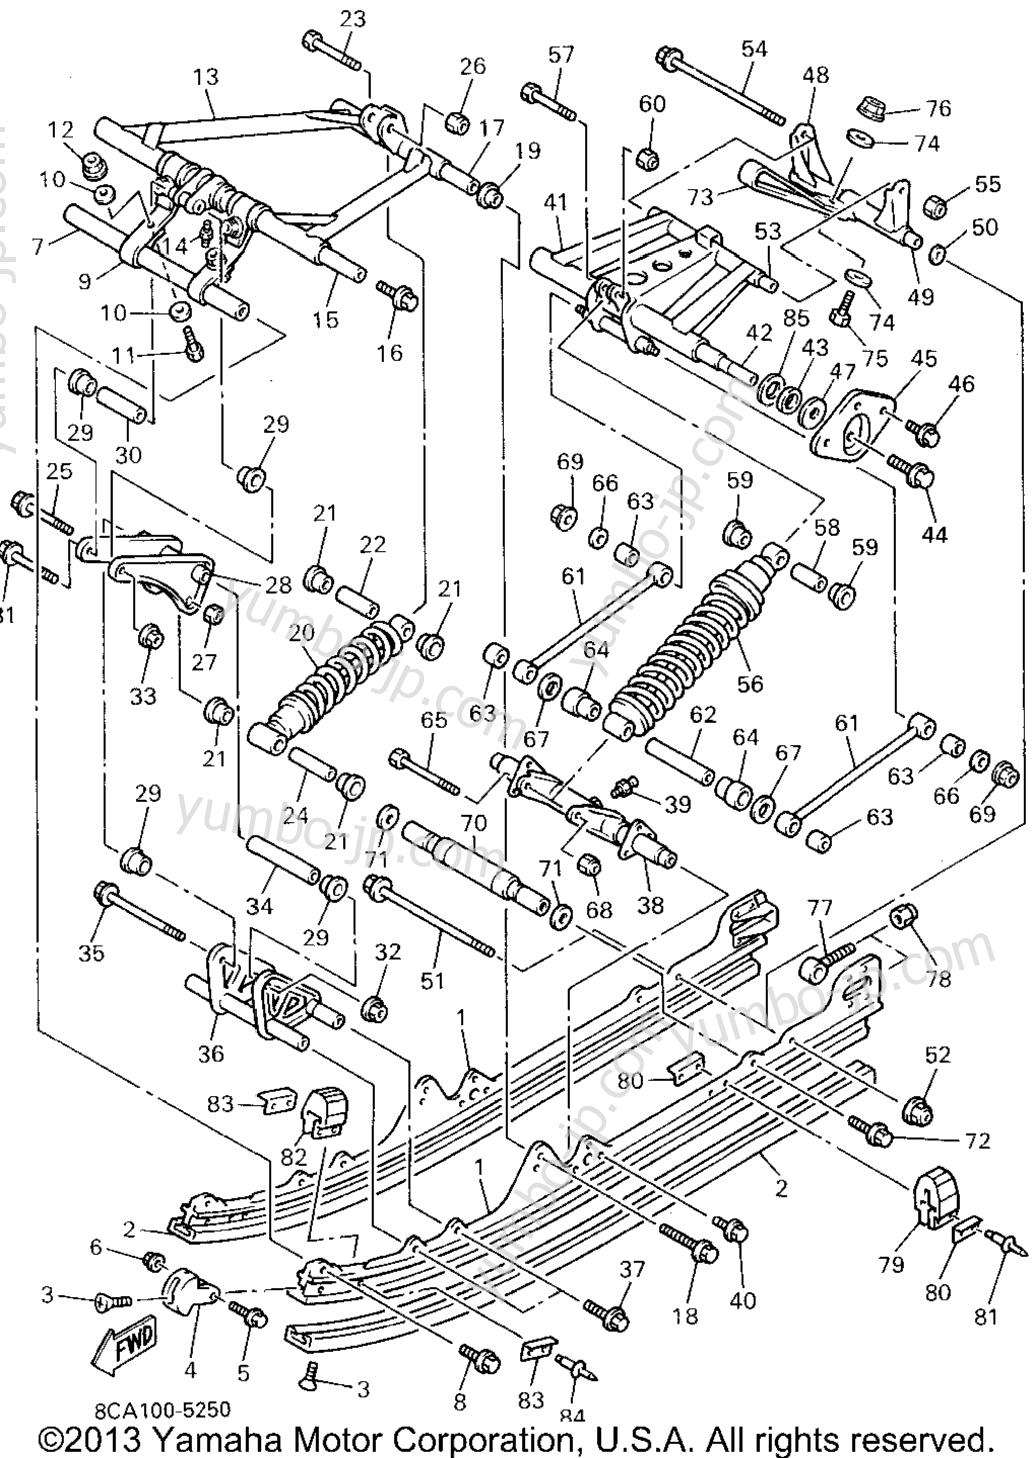 Track Suspension 2 Yamaha Vmax 600 Le Elec Start Engine Diagram